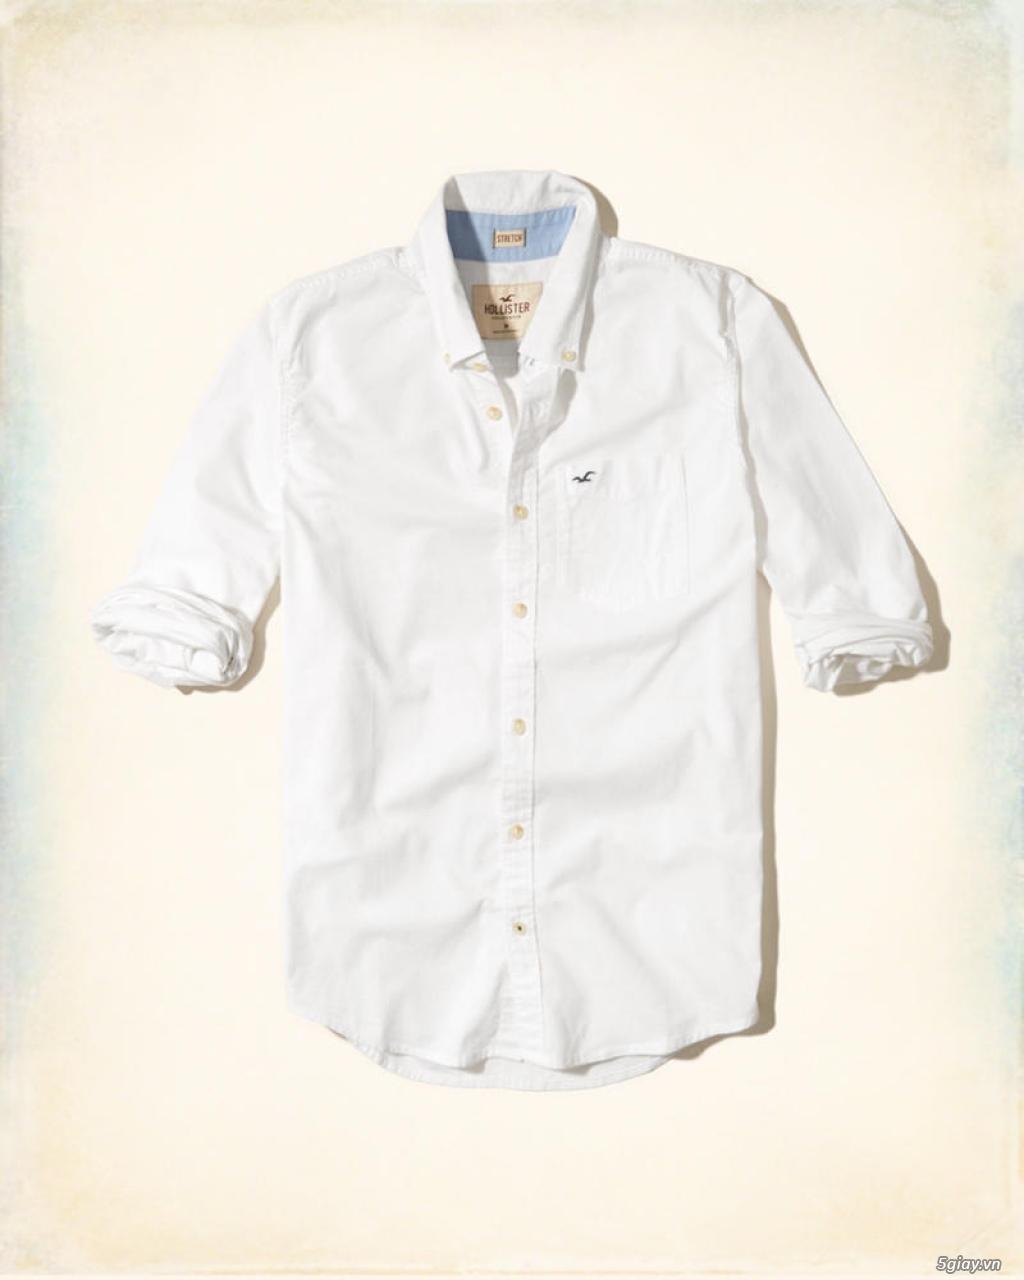 [ Lamanshop.com ]- Quần áo HOLLISTER - ABERCROMBIE & FITCH - Chính hãng USA 100% - 1